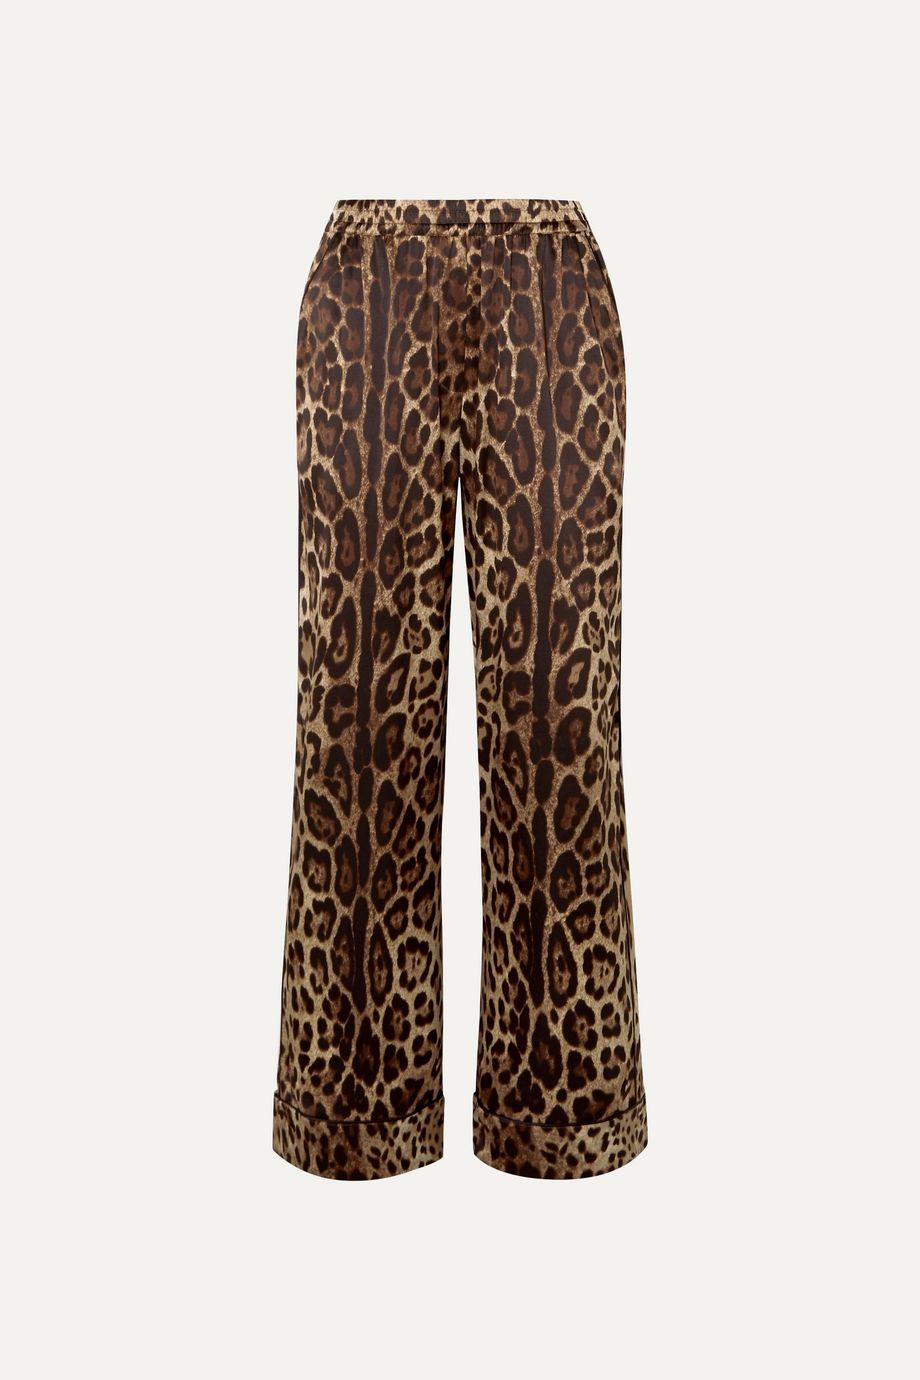 Dolce & Gabbana Leopard-print stretch-silk satin wide-leg pants